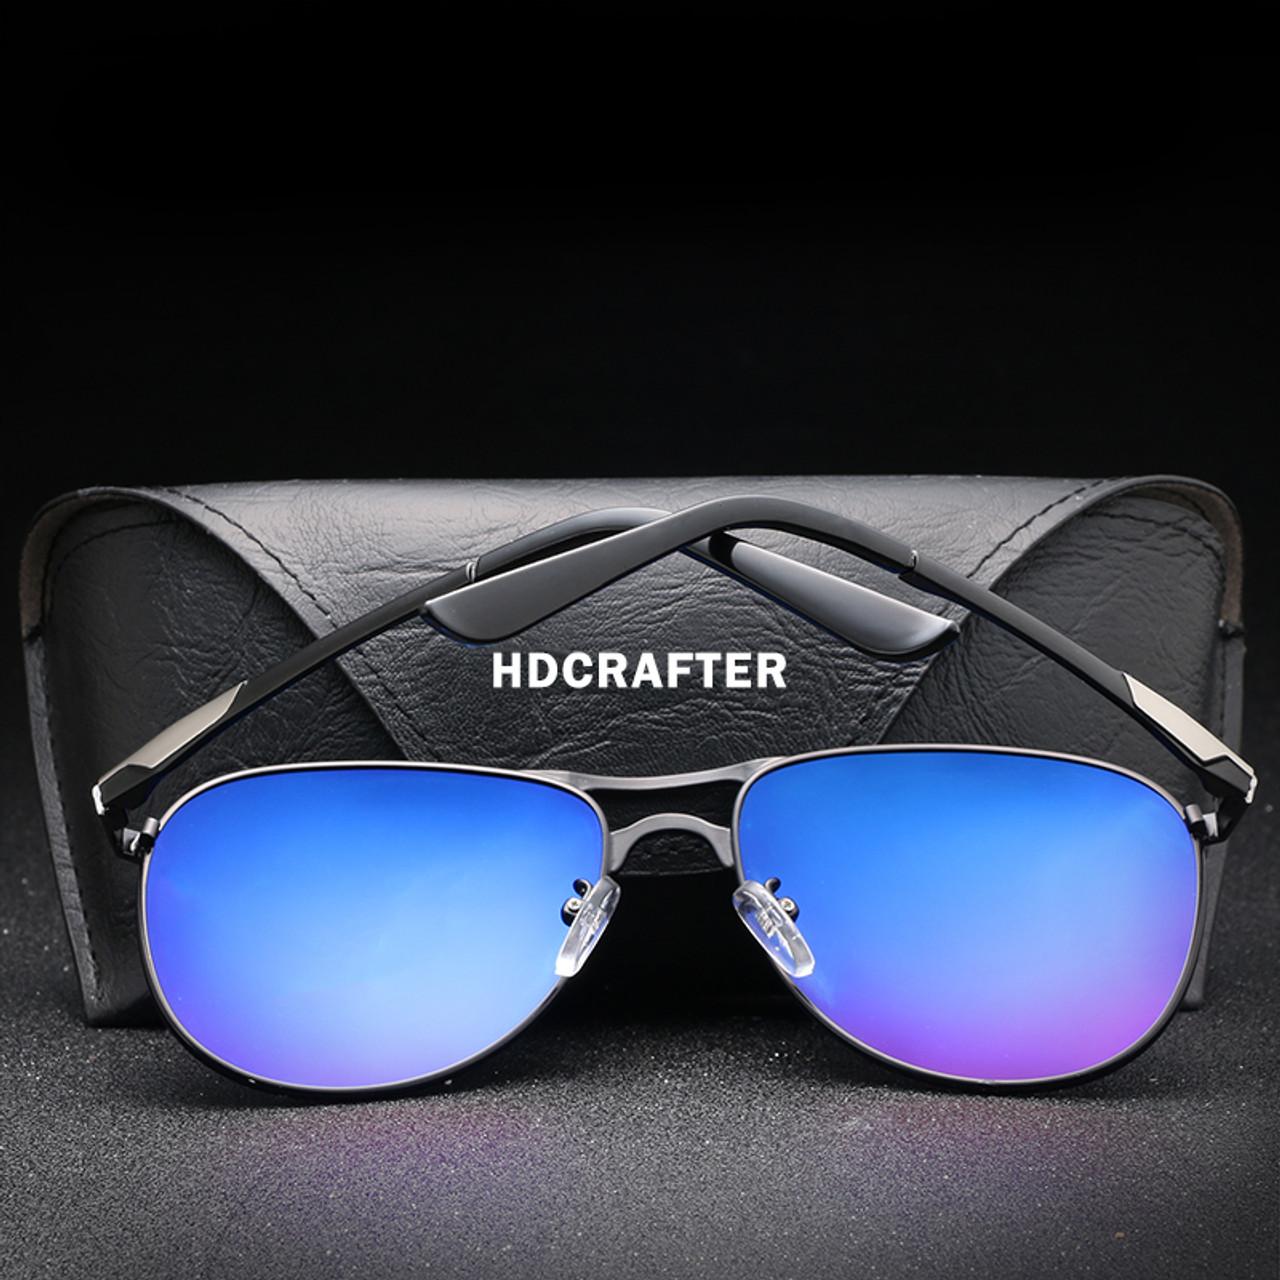 6f2ecb954 ... HDCRAFTER Brand Designer Polarized Sunglasses Man Cool Sun Glasses Men  UV400 Protection Goggle Eyewear Accessories For ...